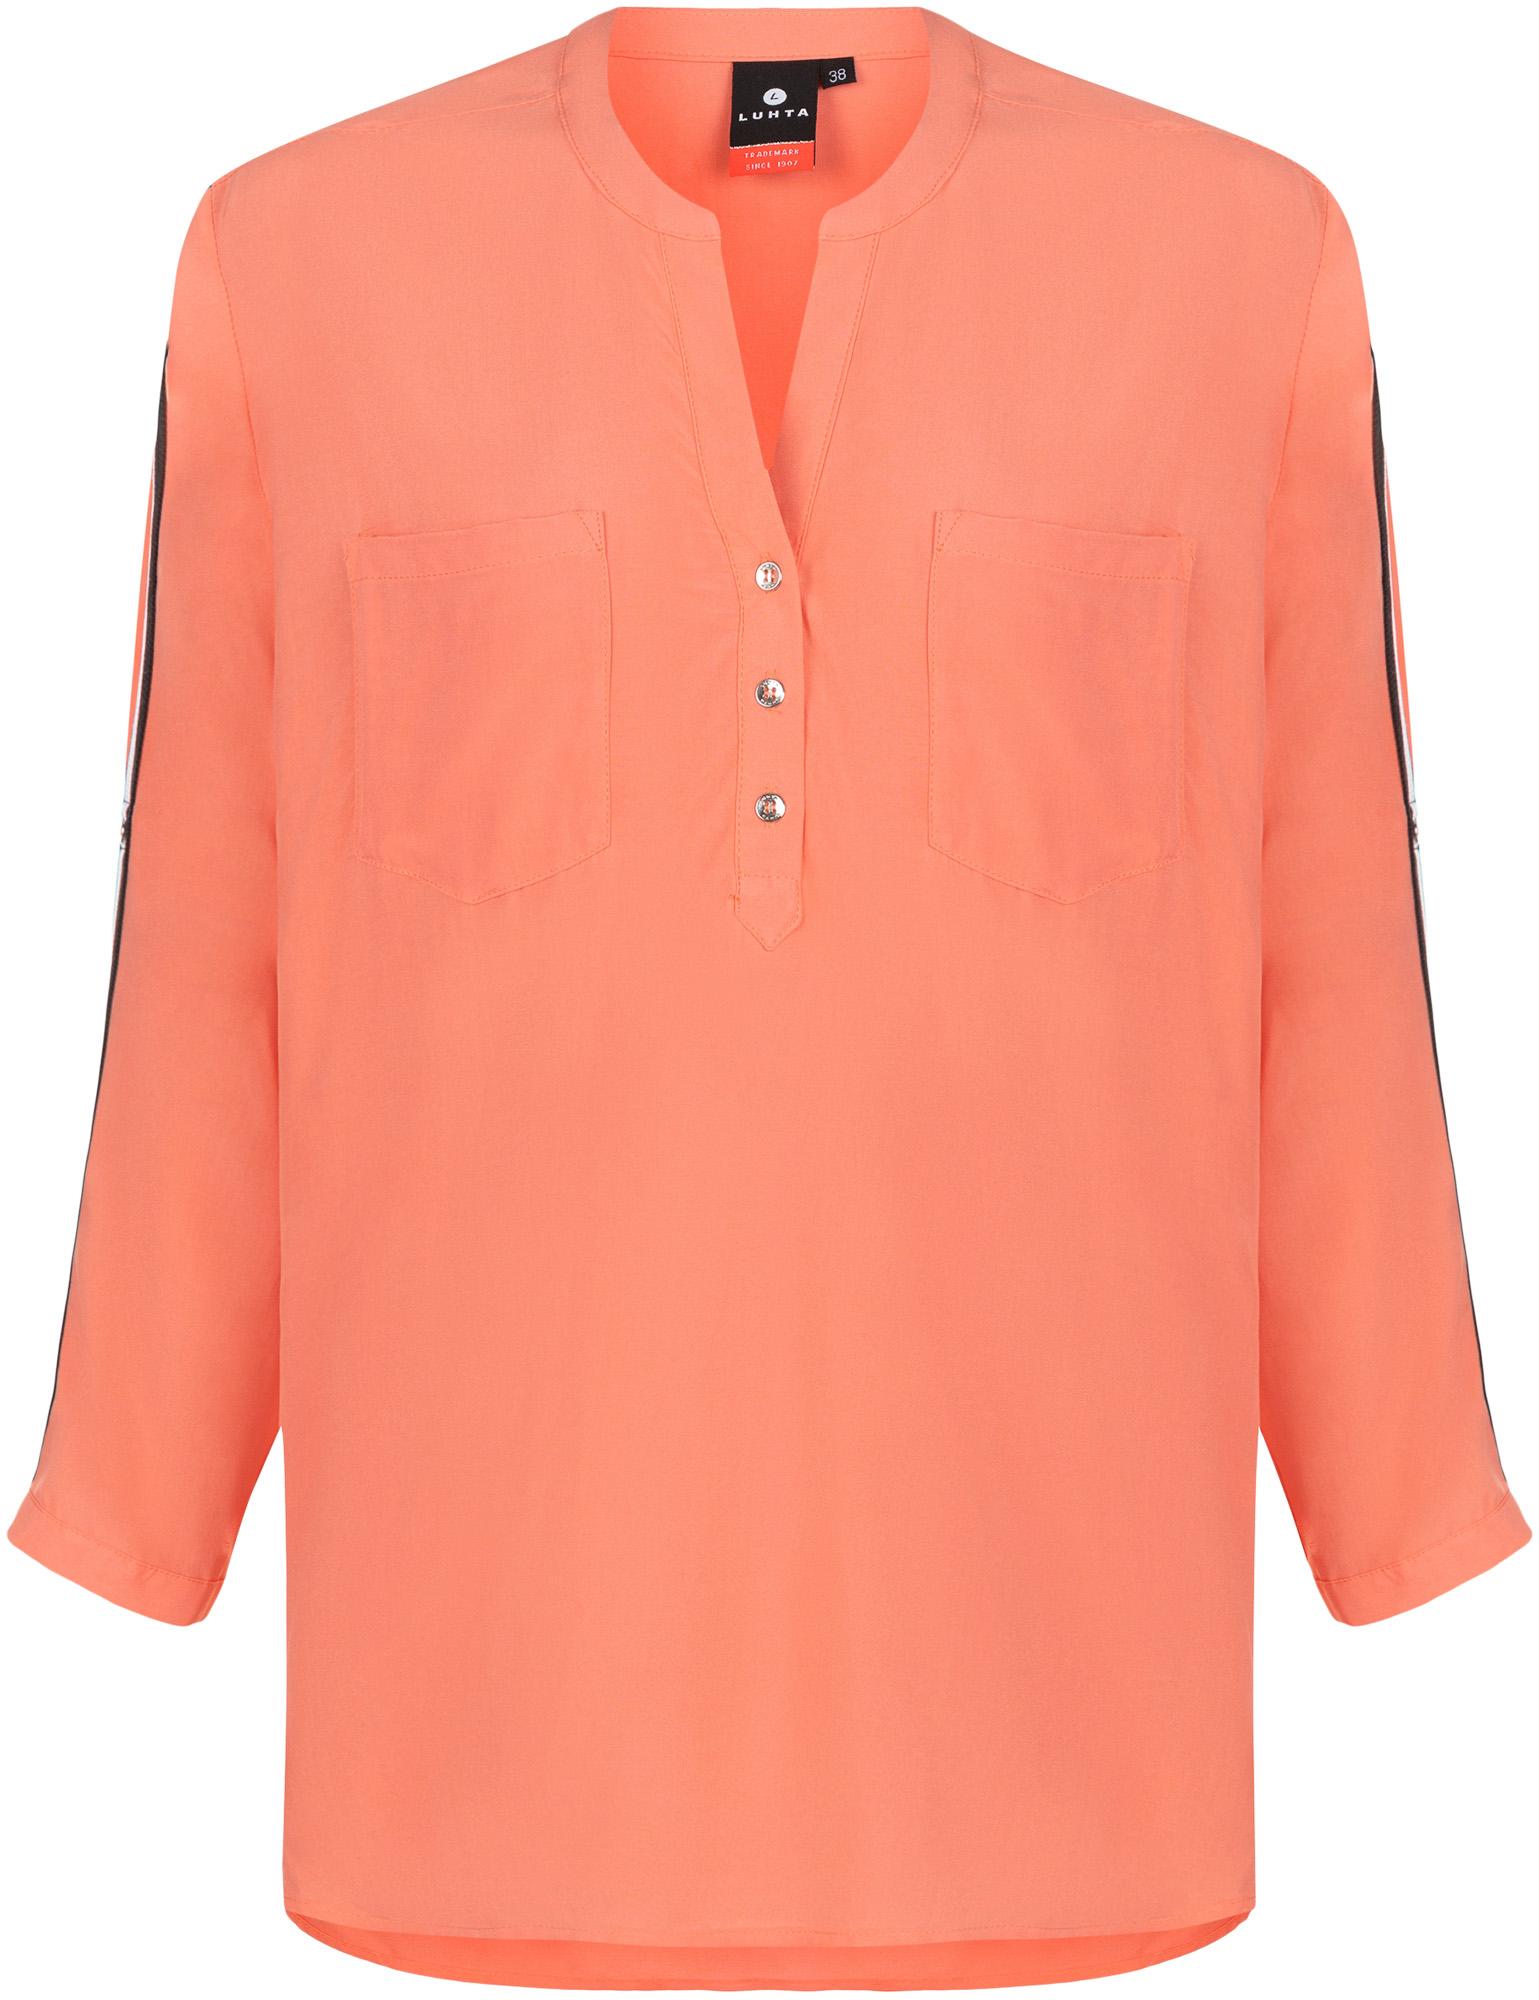 цена на Luhta Рубашка женская Luhta Attala, размер 50